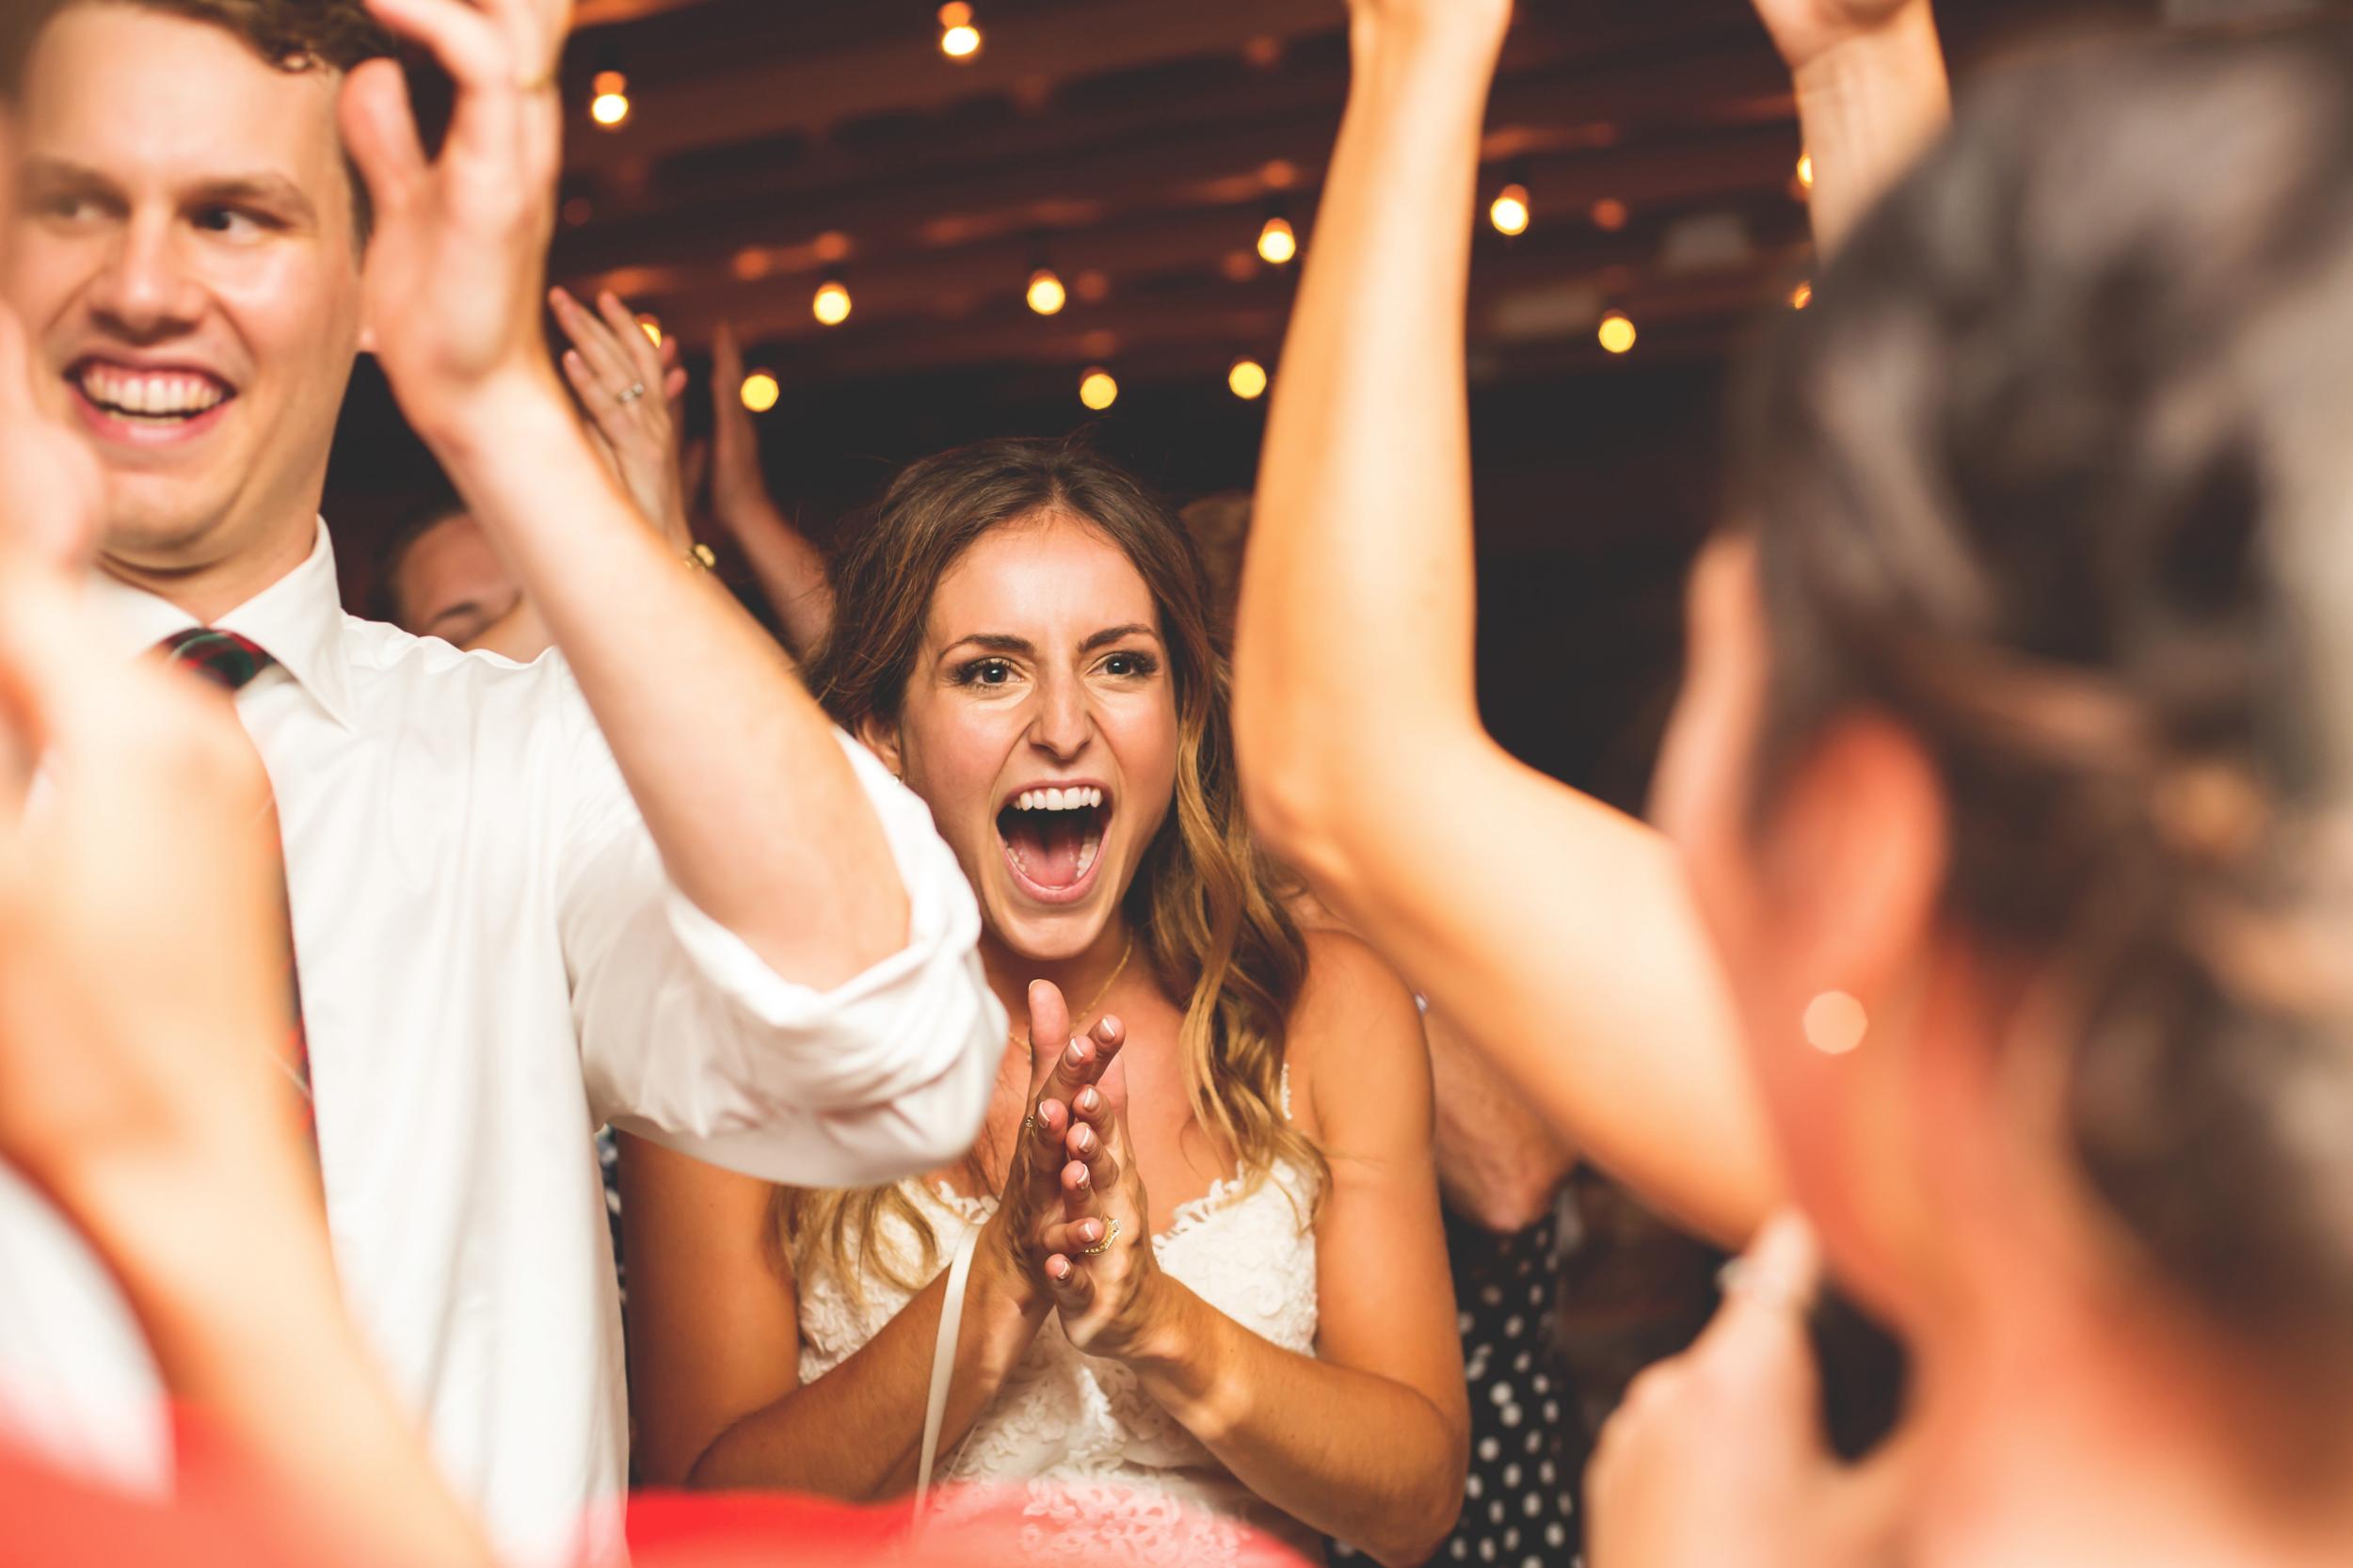 Wedding-Photos-Muskoka-Clevelands-House-Photographer-Wedding-Hamilton-GTA-Niagara-Oakville-Moments-by-Lauren-Photography-Photo-Image-114.png